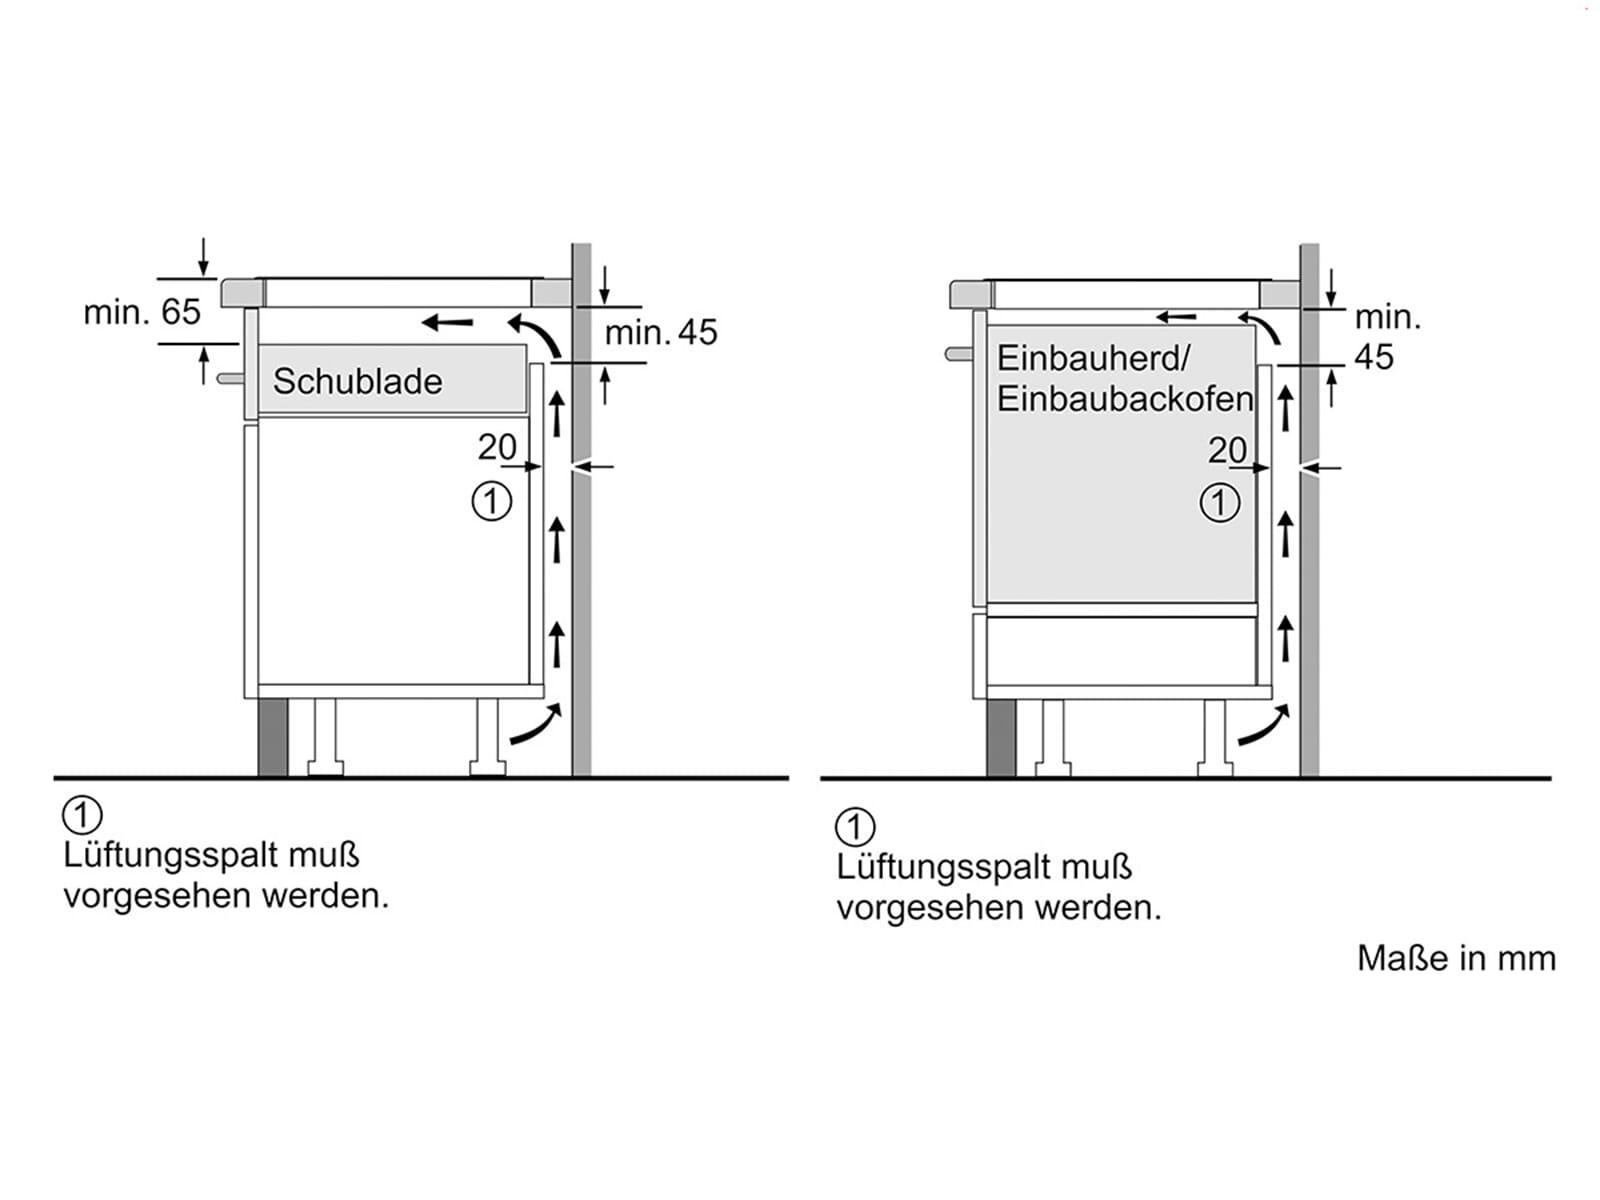 siemens eh875lec1e induktionskochfeld autark. Black Bedroom Furniture Sets. Home Design Ideas